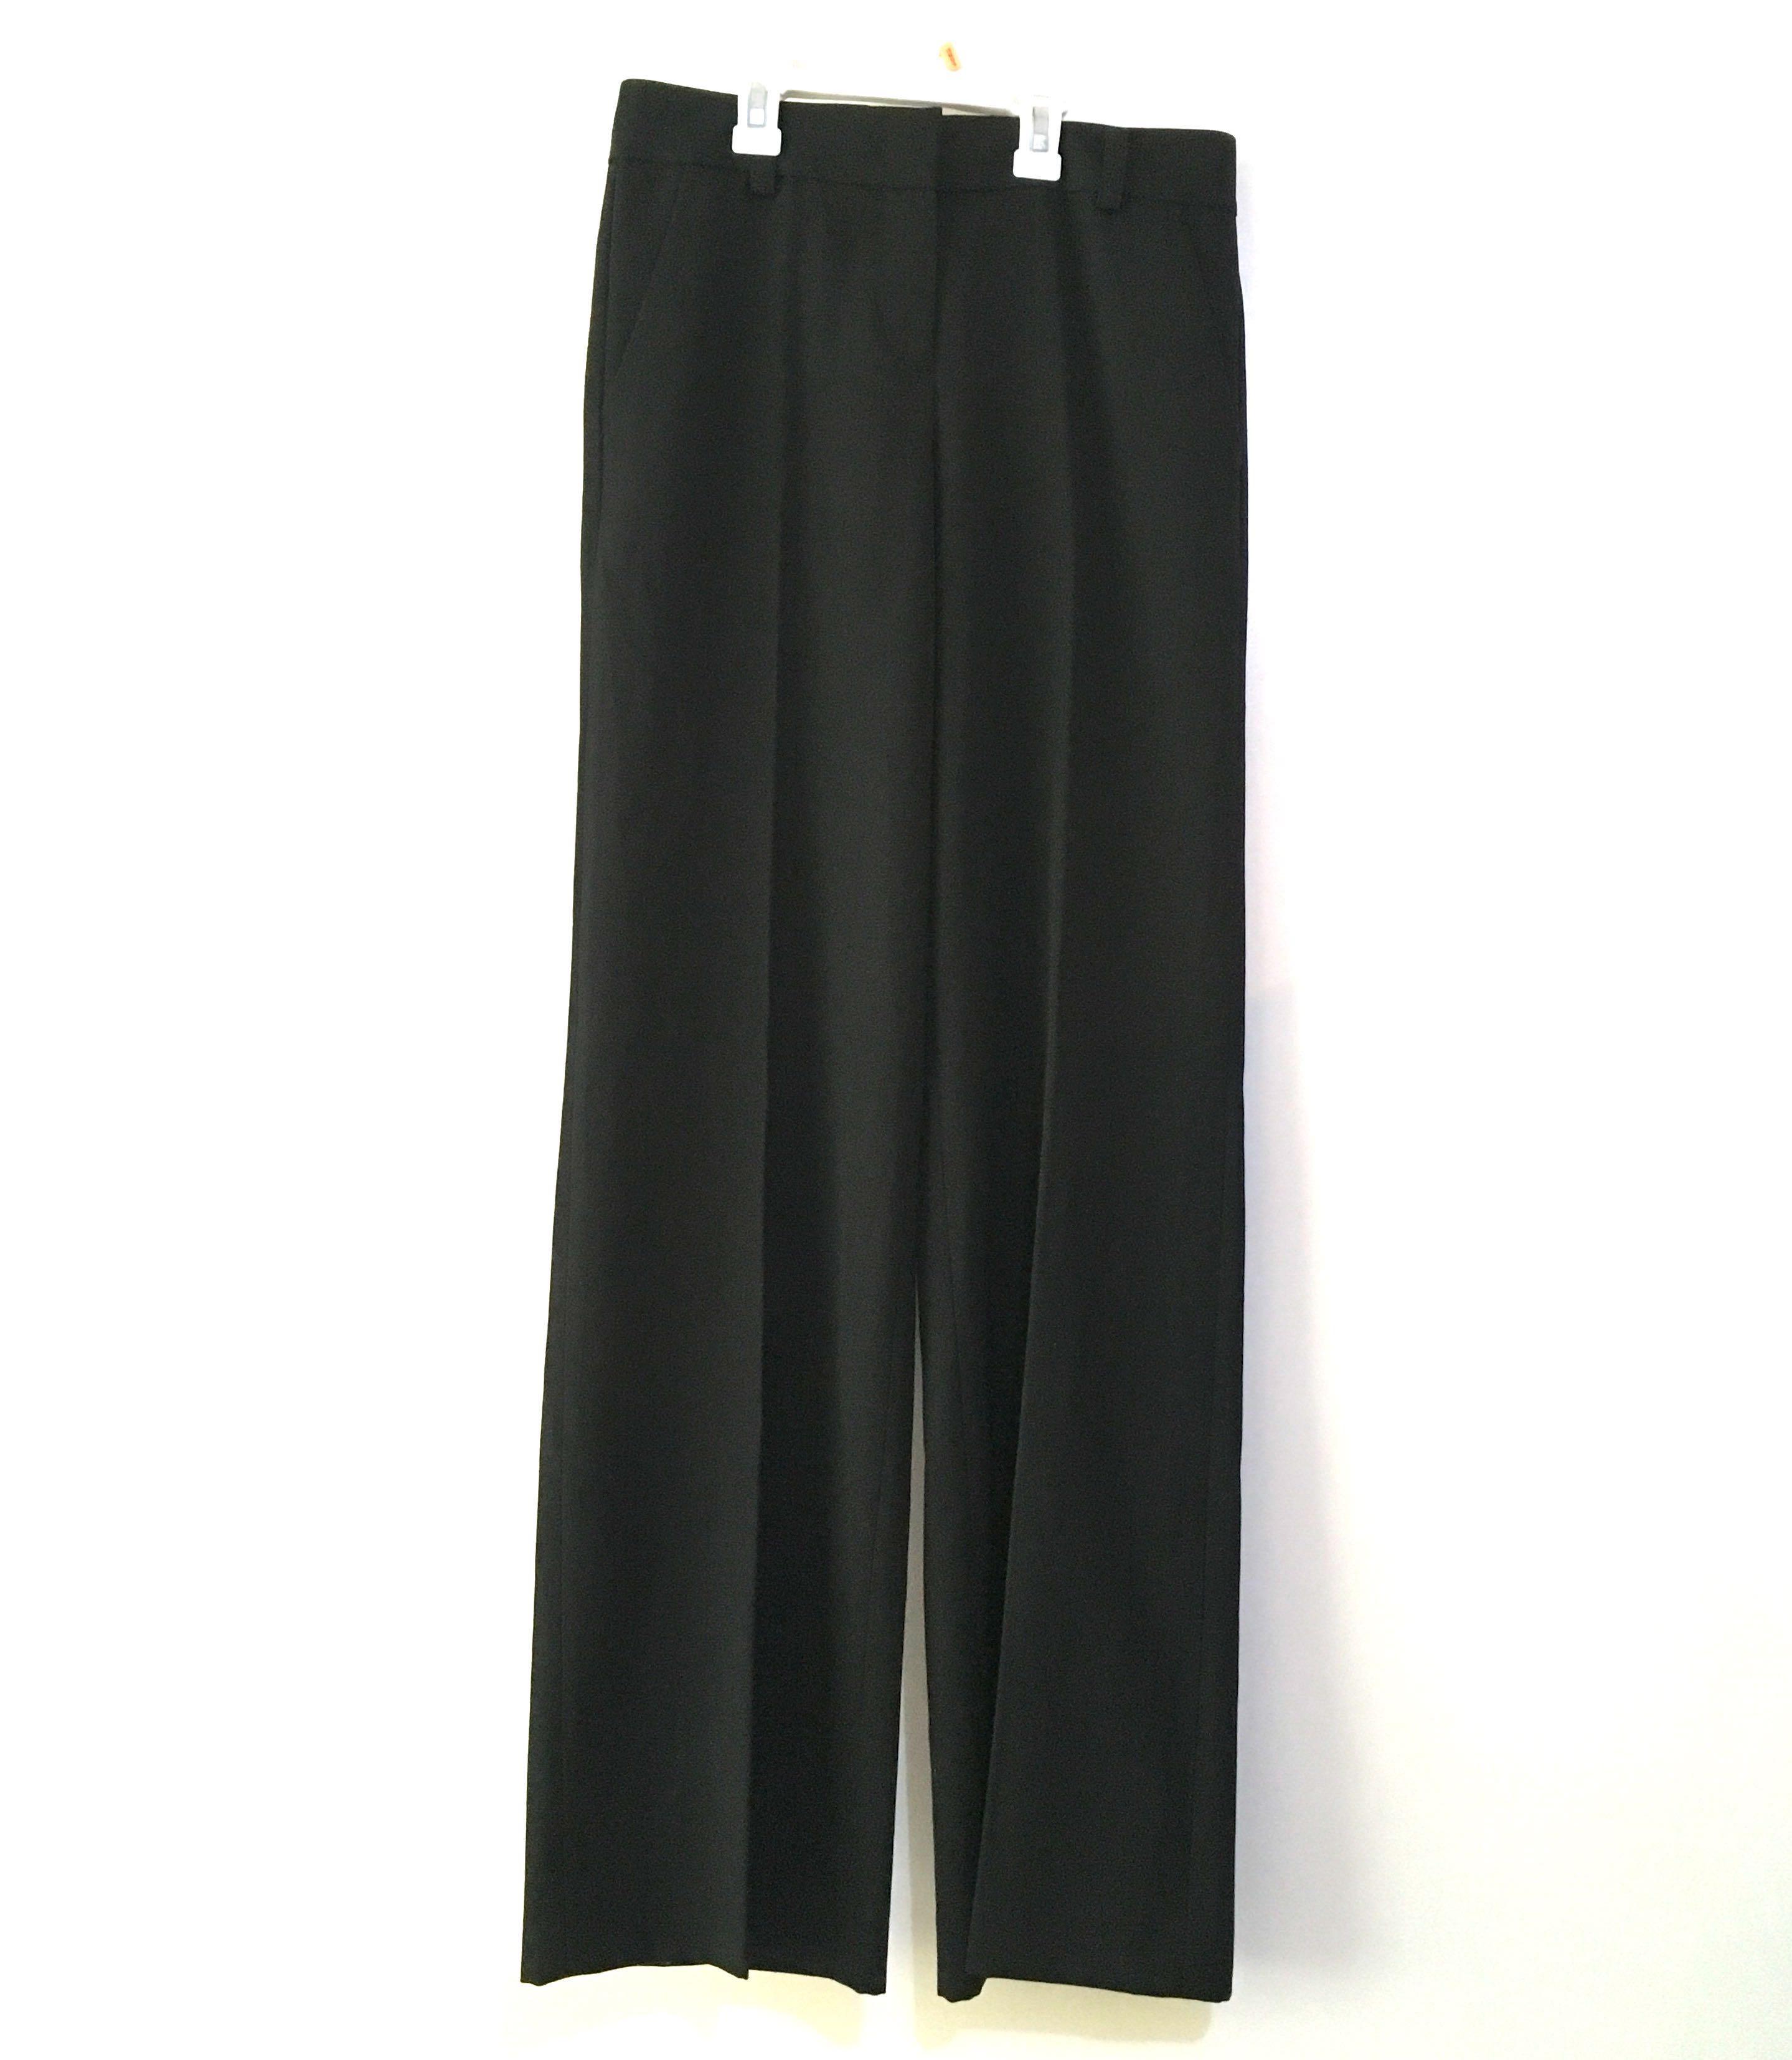 Charity Sale! Authentic DKNY Black Wide Leg Long Work Dress Pants Women Slacks Size 2